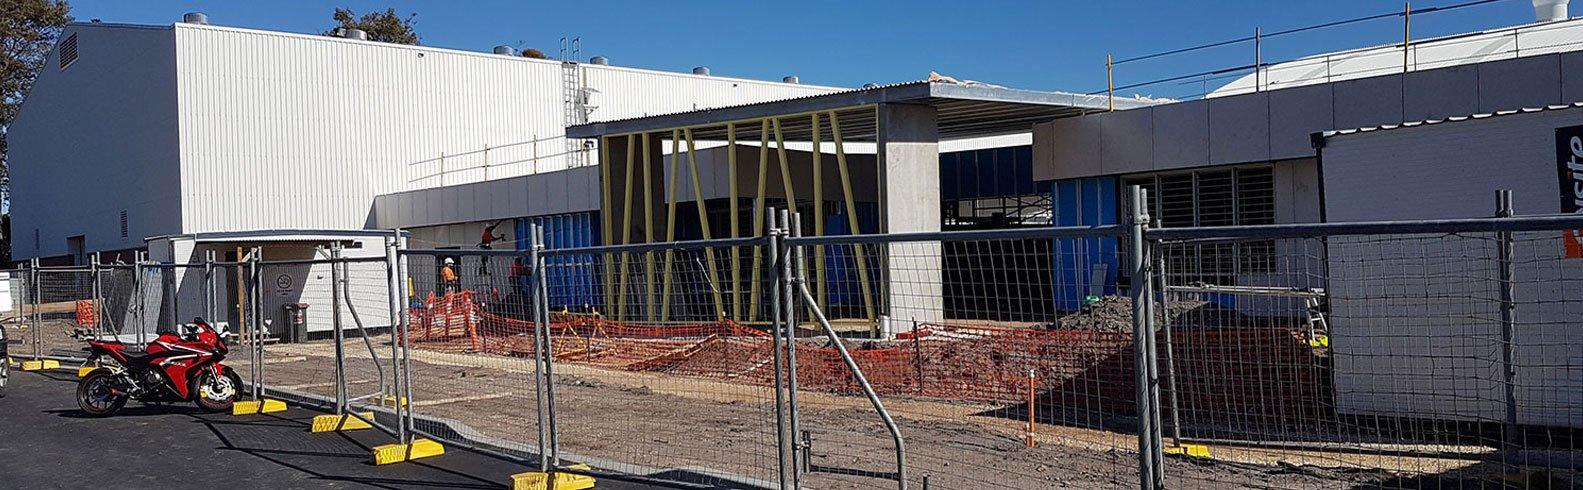 Basket Ball Indoor Sports Stadium Port macquarie -  Commercial Cladding